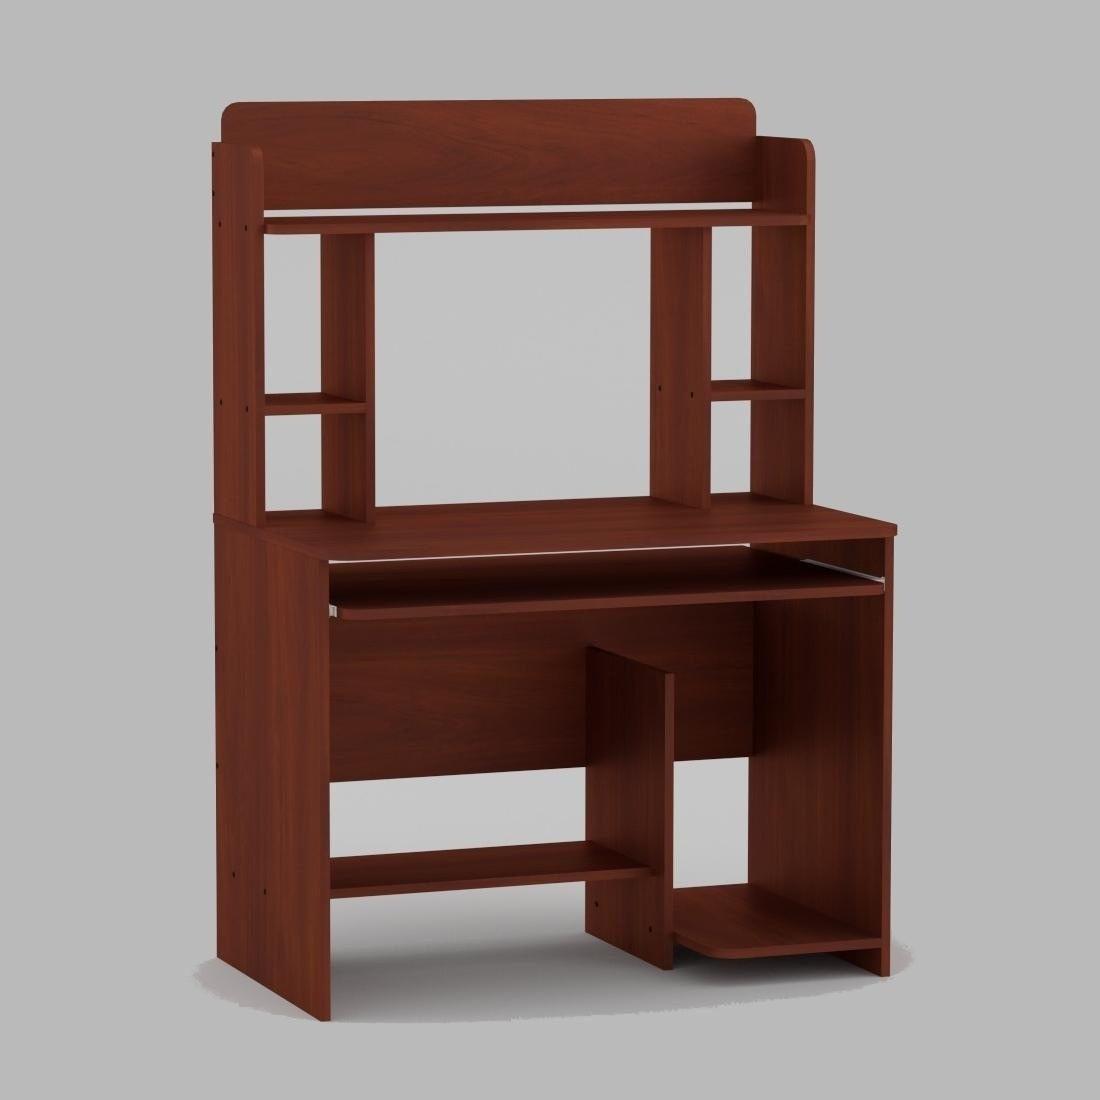 Компьютерный стол Компанит СКМ-6 1000х598х756 мм яблоня